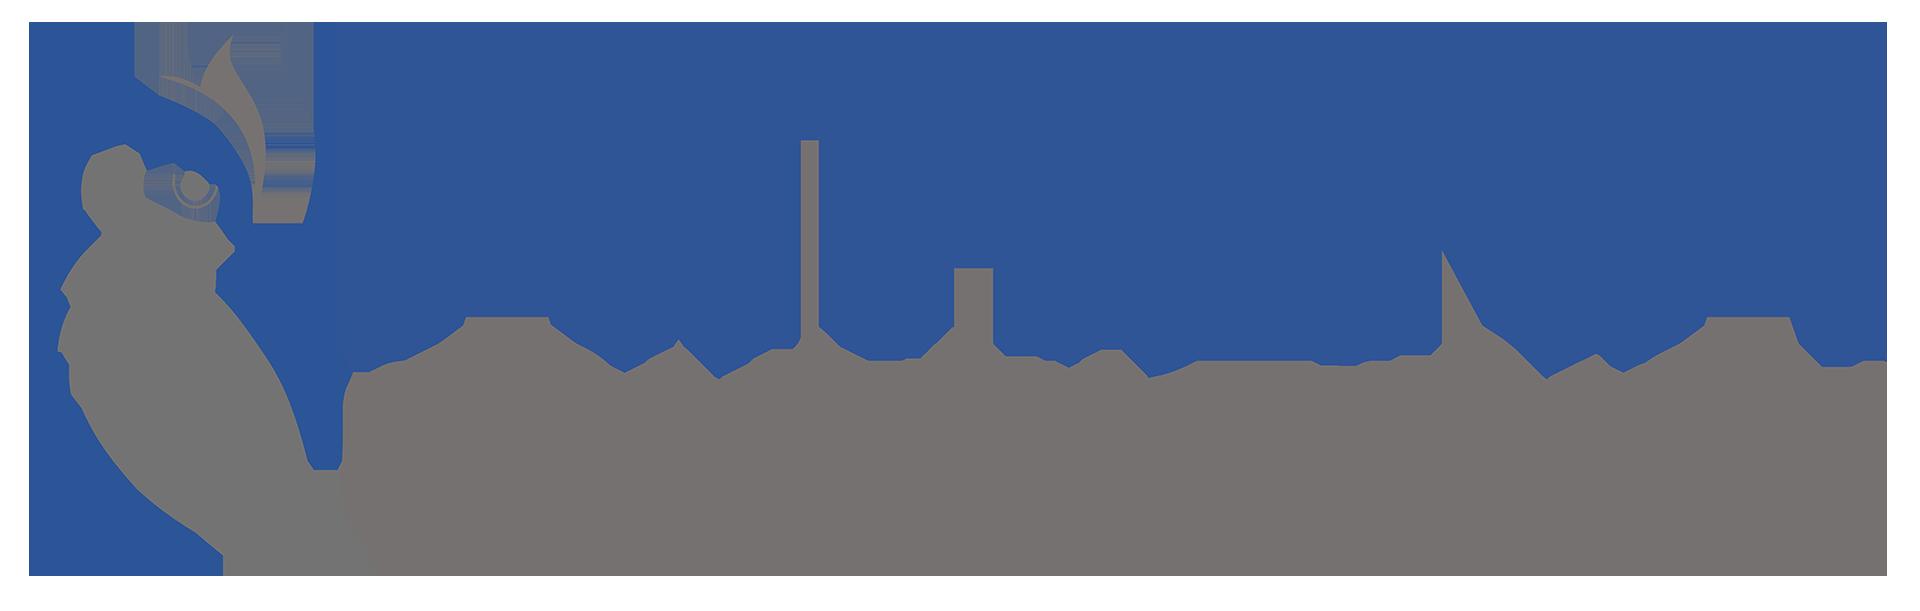 Athena_Consultancy_Small